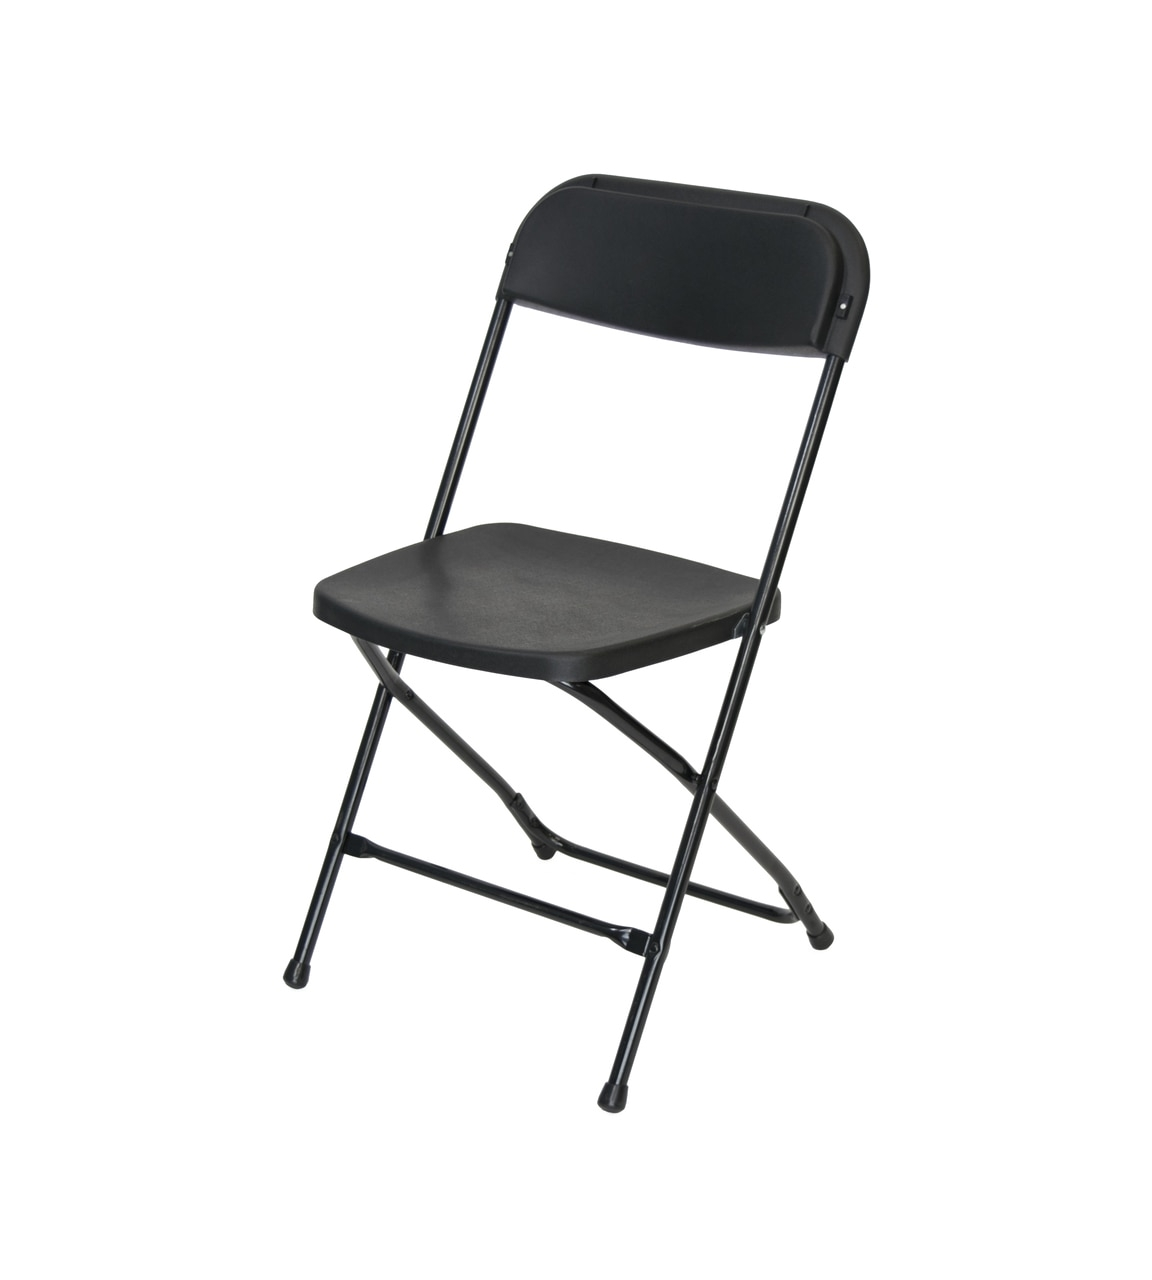 Folding Chairs Cloth Seat Black Plastic Folding Chair Premium Rental Style